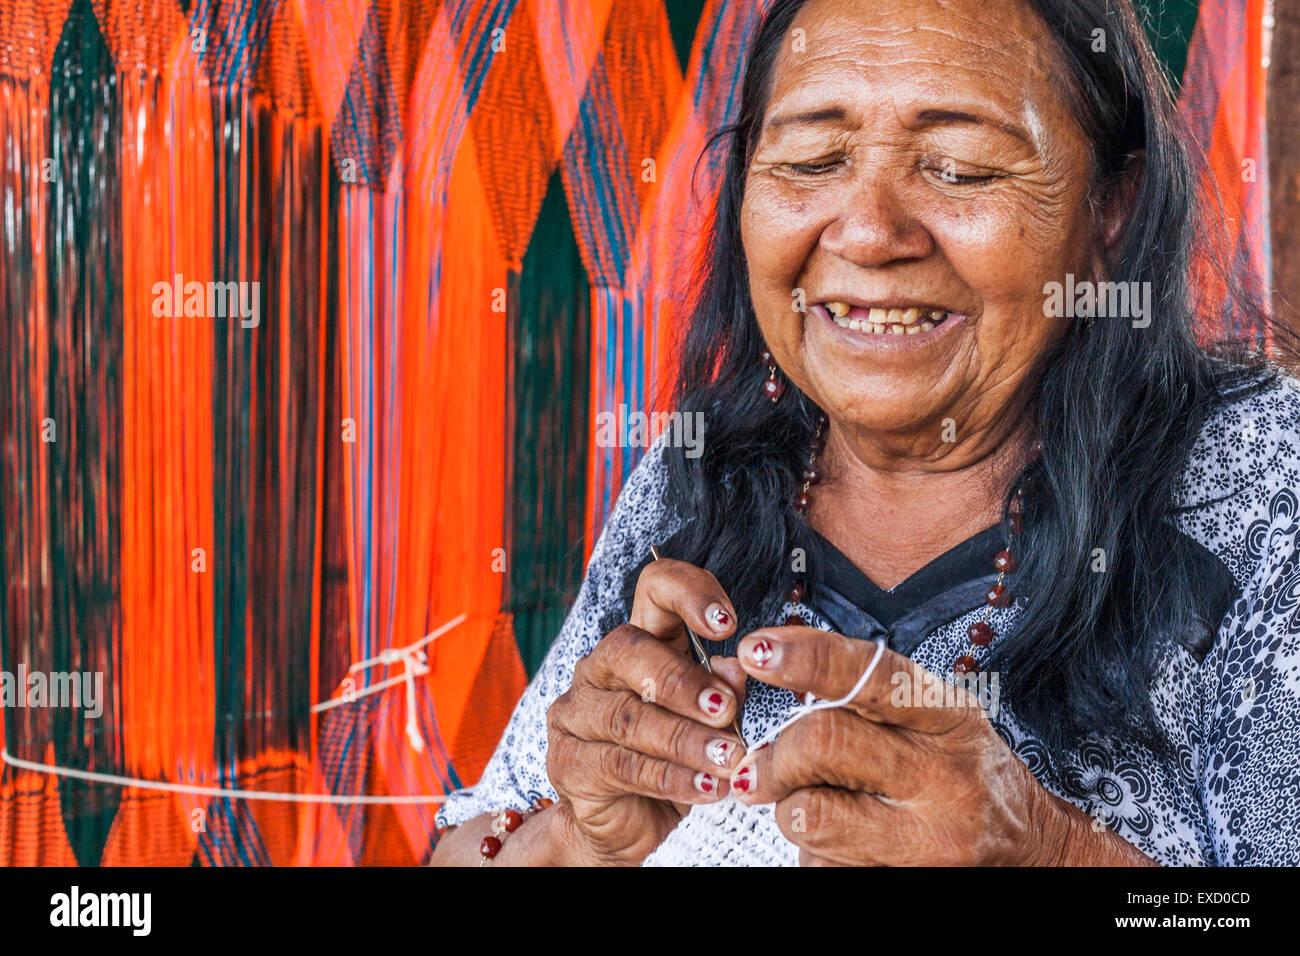 Elderly Wayuu indigenous woman weaving a 'chinchorro' or Colombian Hammock.  Knitting, crocheting and weaving - Stock Image